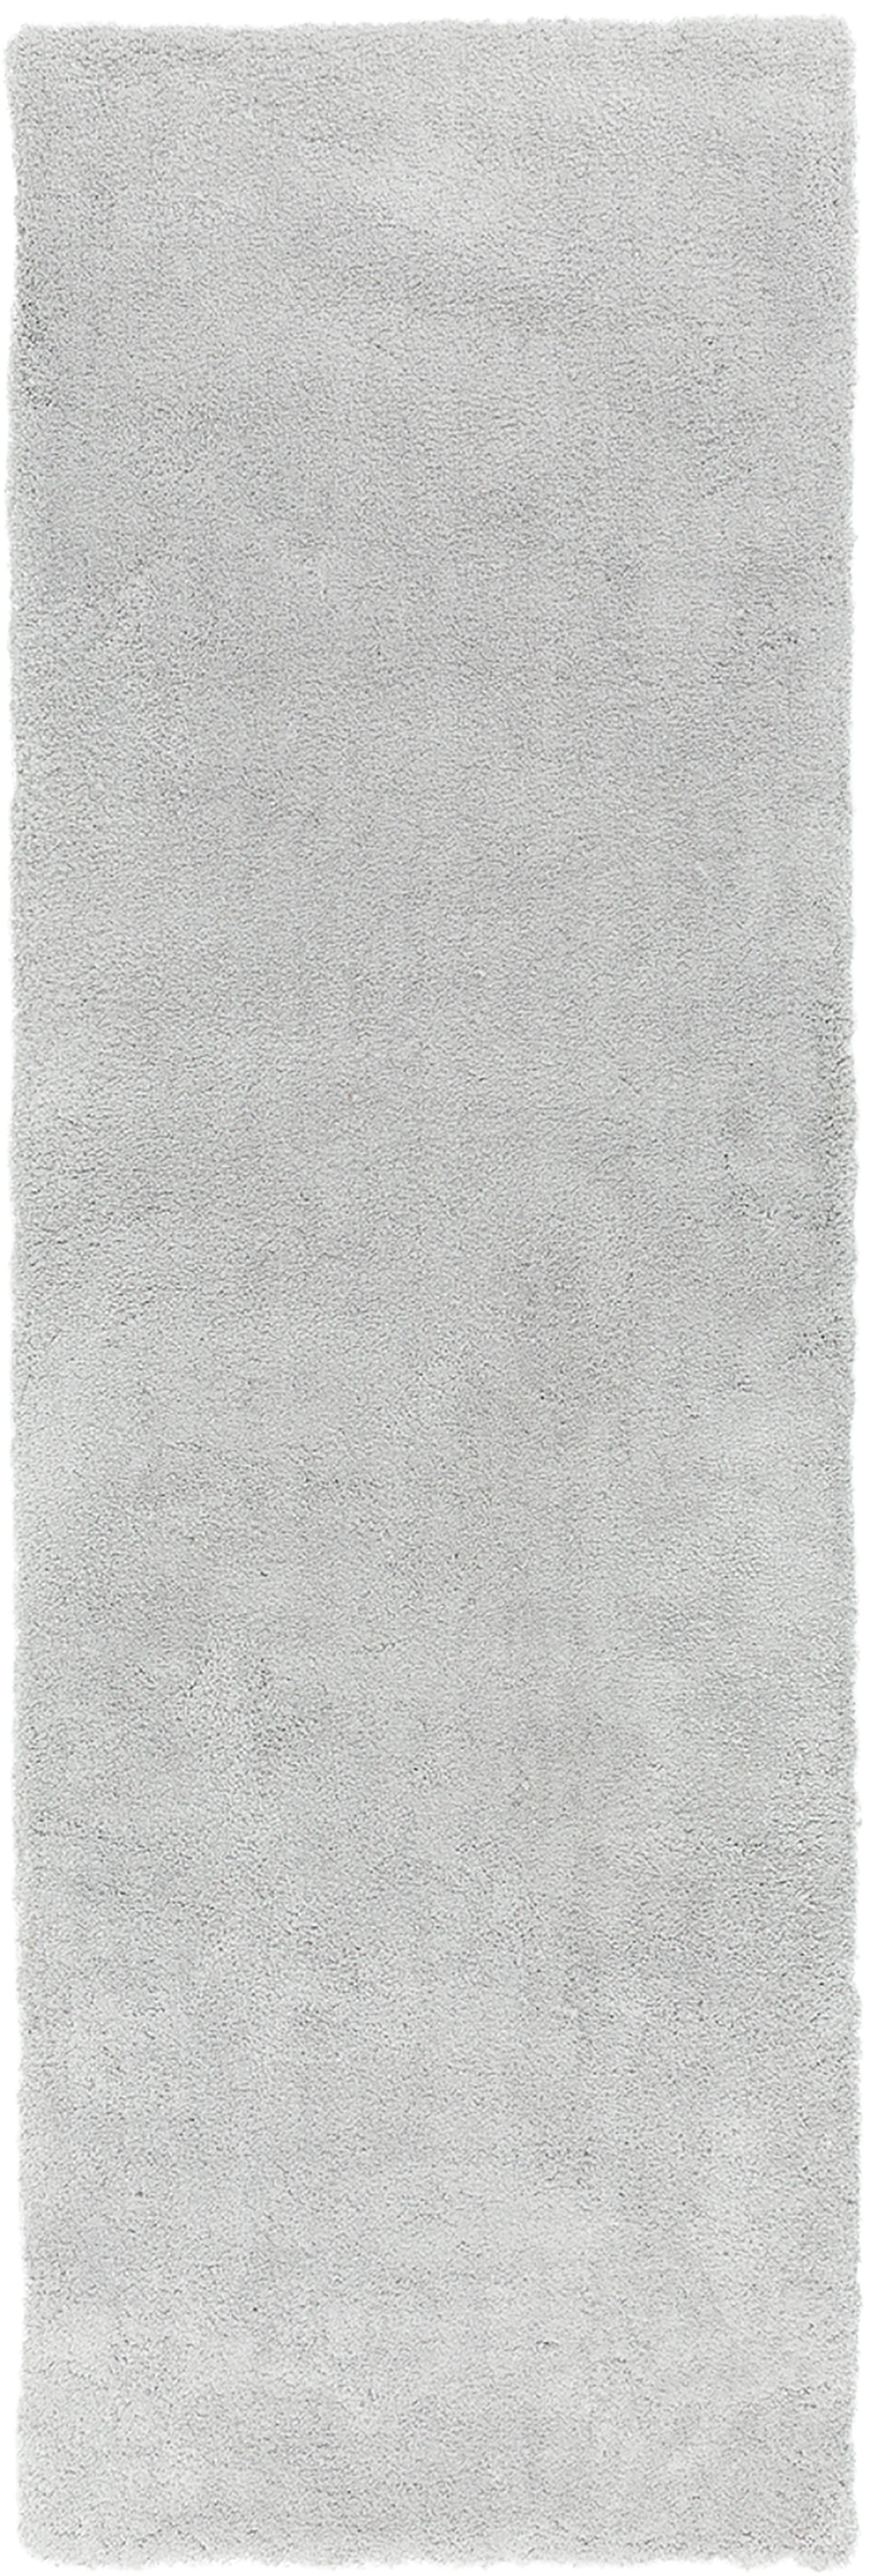 Passatoia pelosa morbida grigio chiaro Leighton, Retro: 70% poliestere, 30% coton, Grigio chiaro, Larg. 80 x Lung. 250 cm